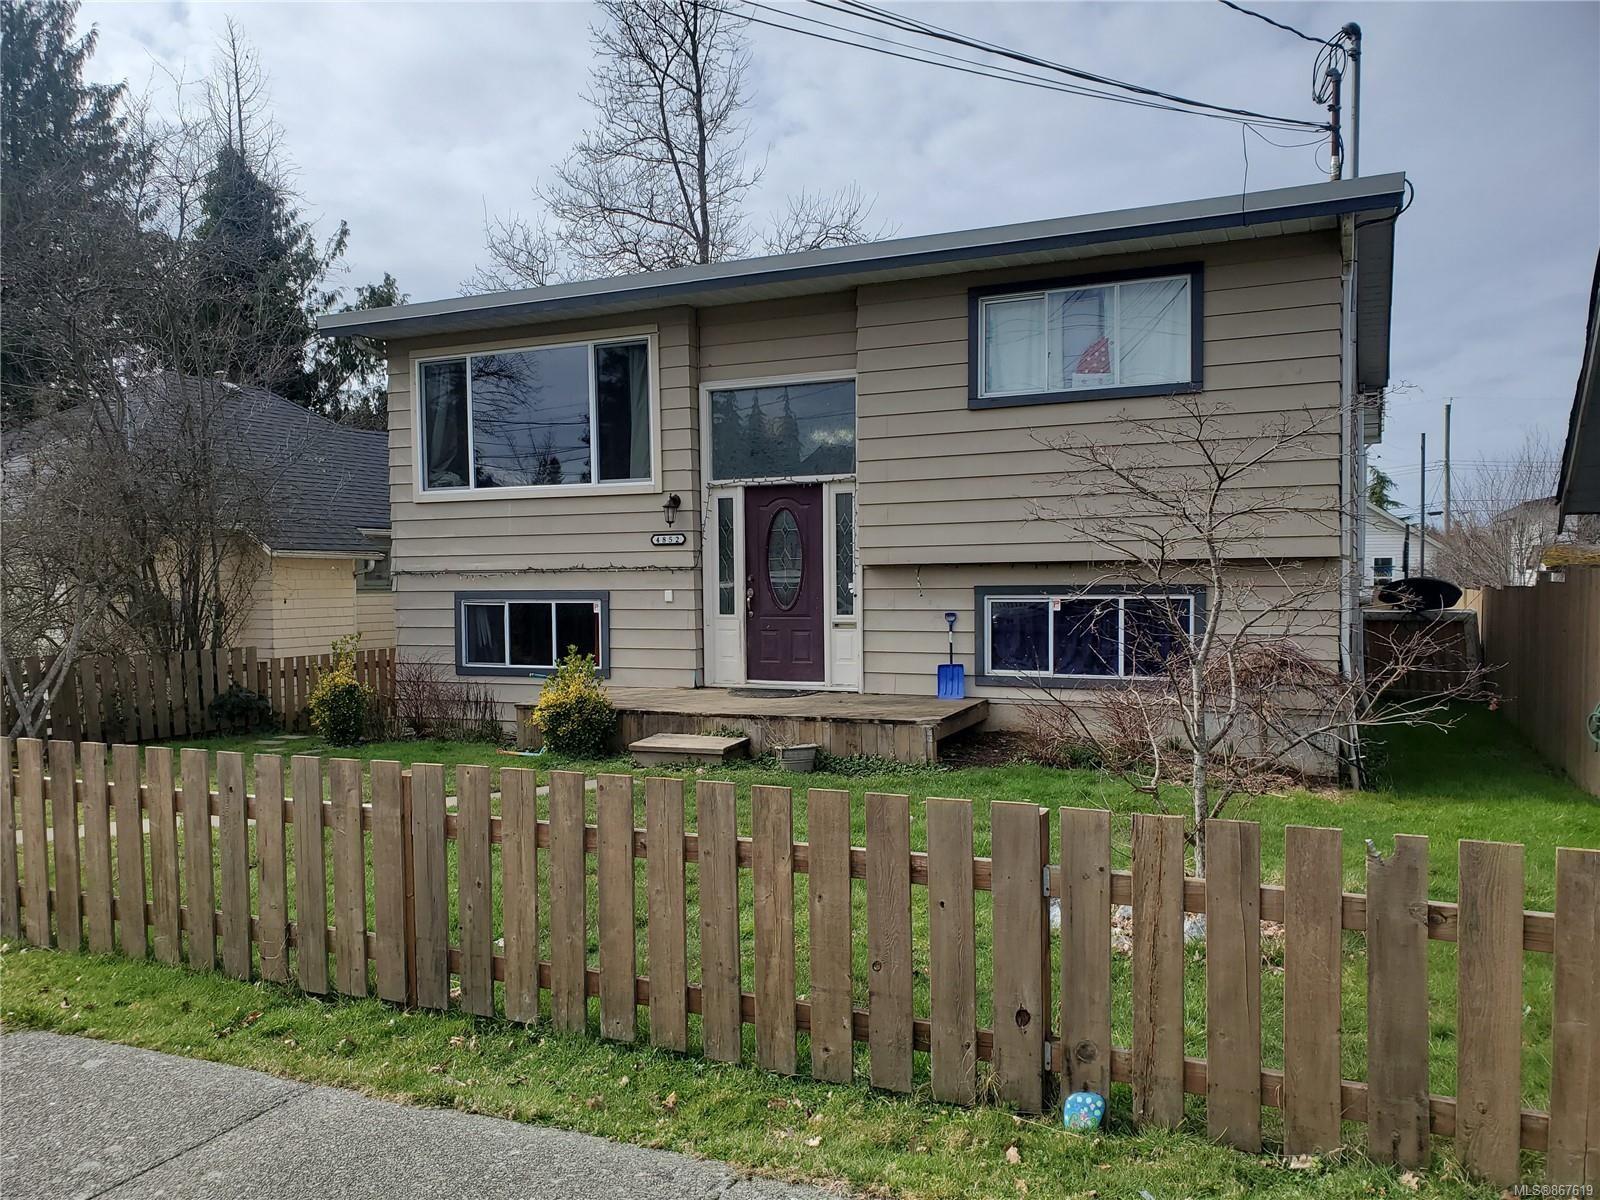 Main Photo: 4852 David St in : PA Port Alberni House for sale (Port Alberni)  : MLS®# 867619